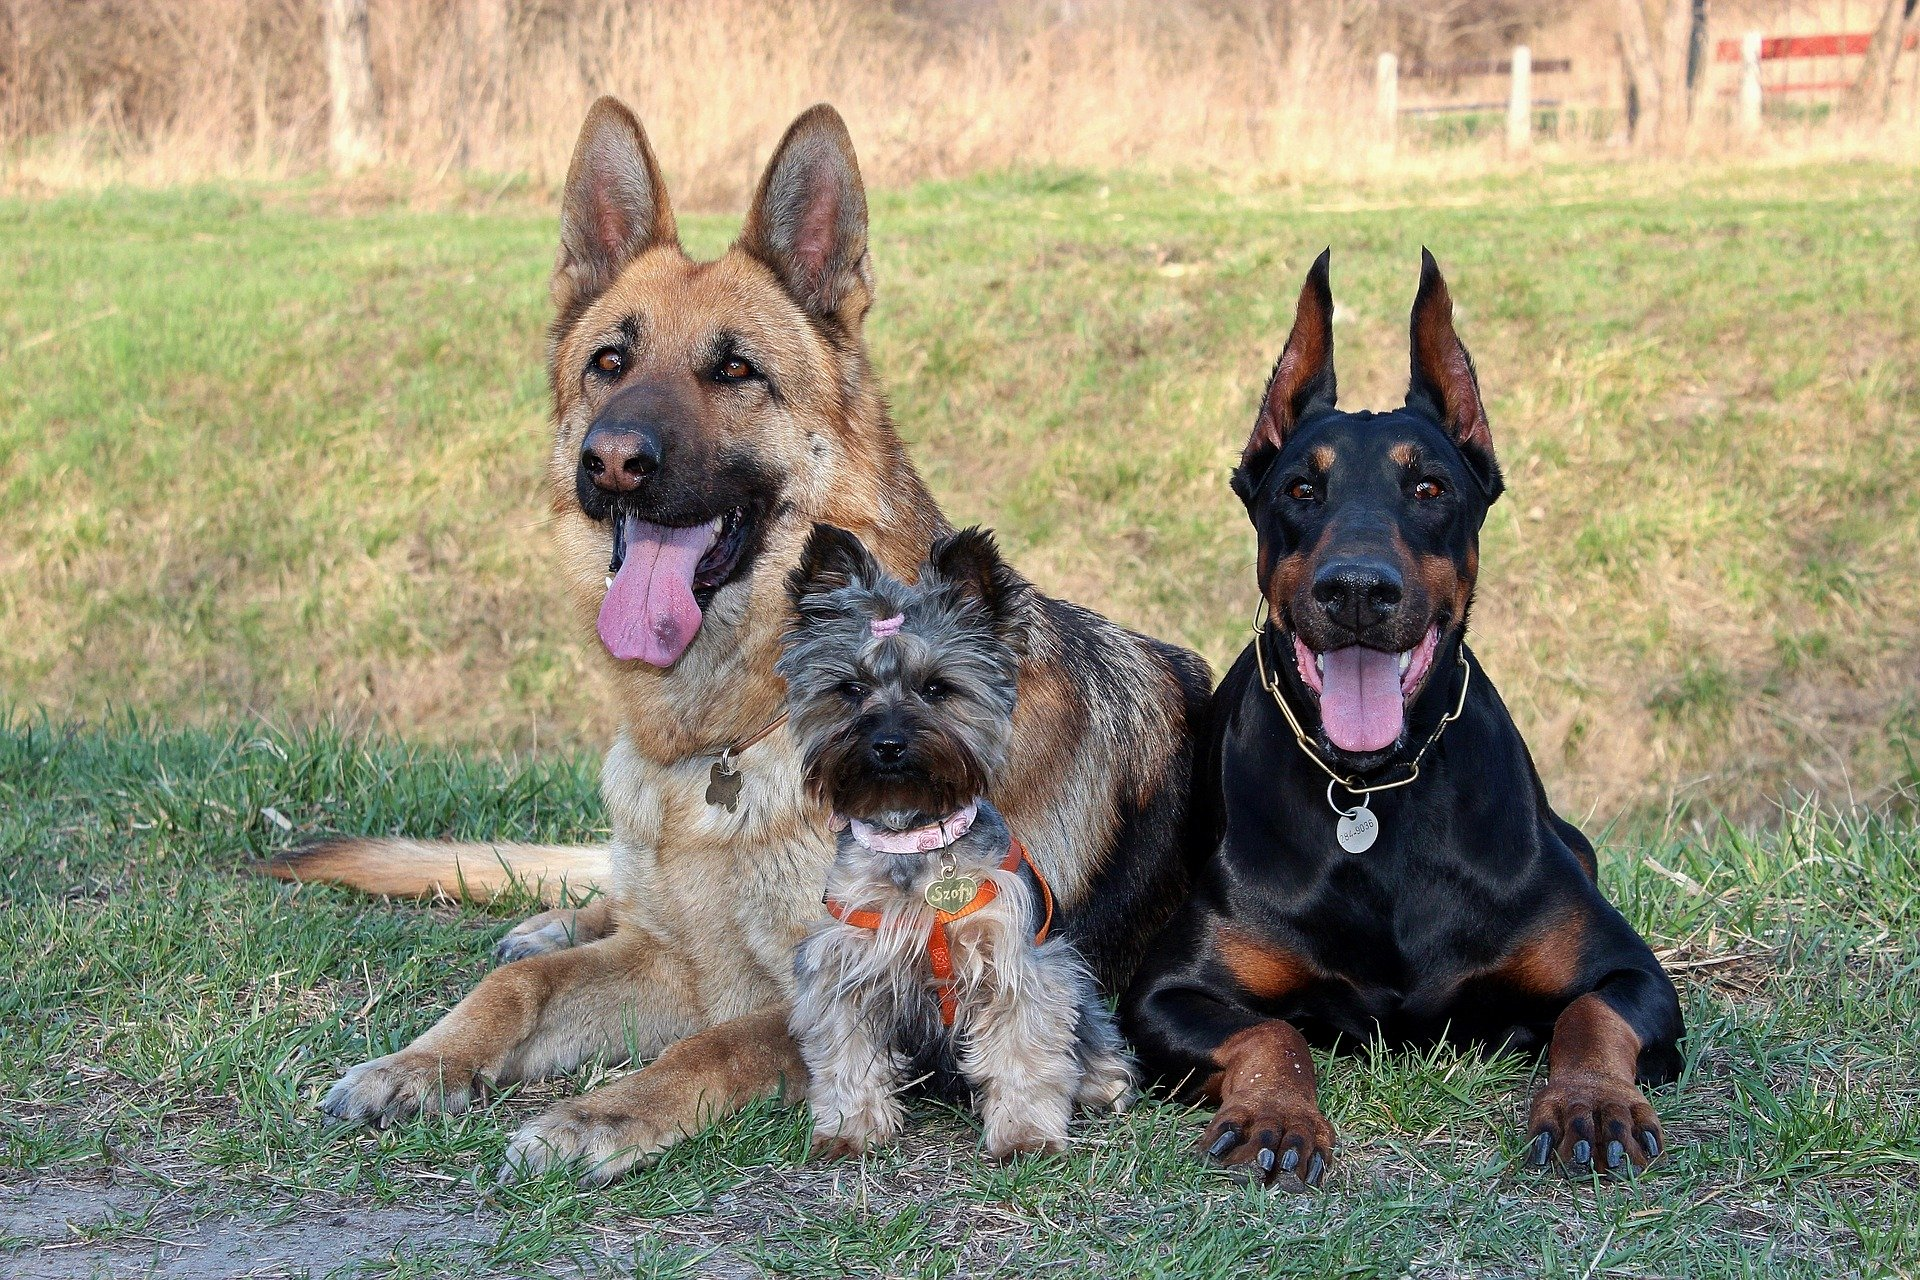 https://www.madpaws.com.au/wp-content/uploads/2020/02/Most-Loyal-Dog-Breeds.jpg